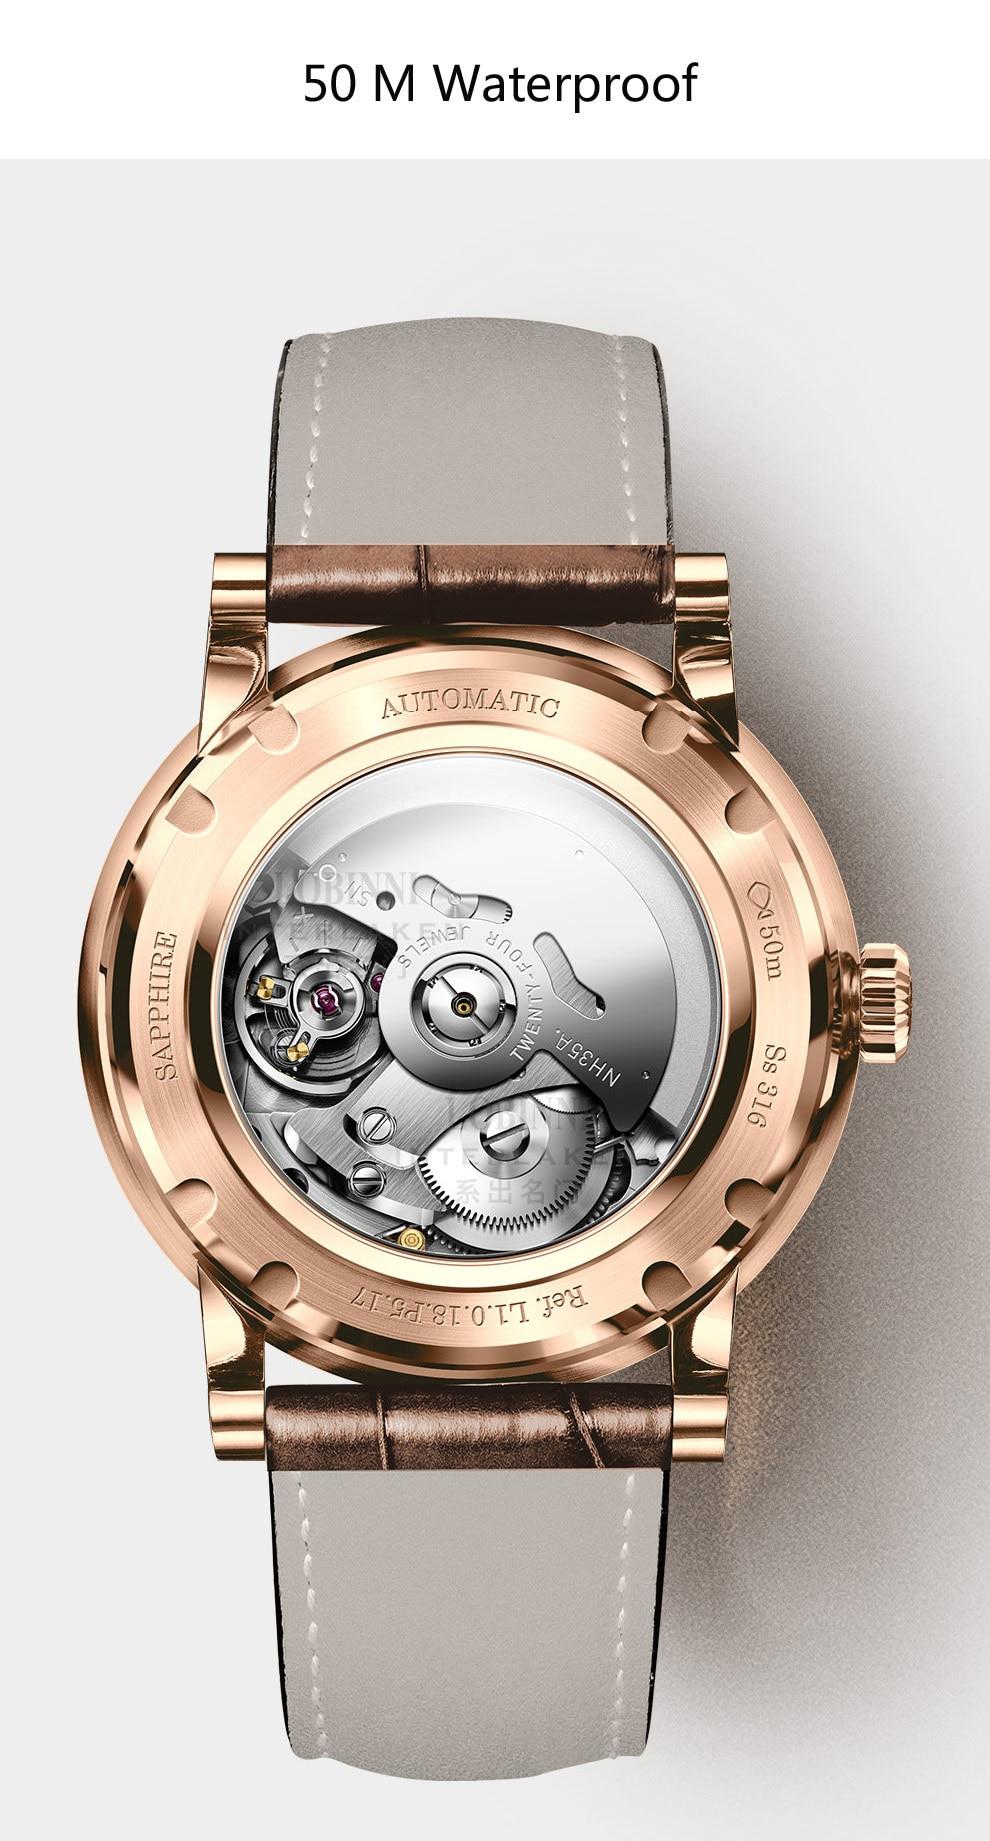 LOBINNI New Men Watches Top Luxury Brand Japan Import NH35A SII O Auto Mechanical MOVT Men's Clock Sapphire reloj hombre L1018-8 16